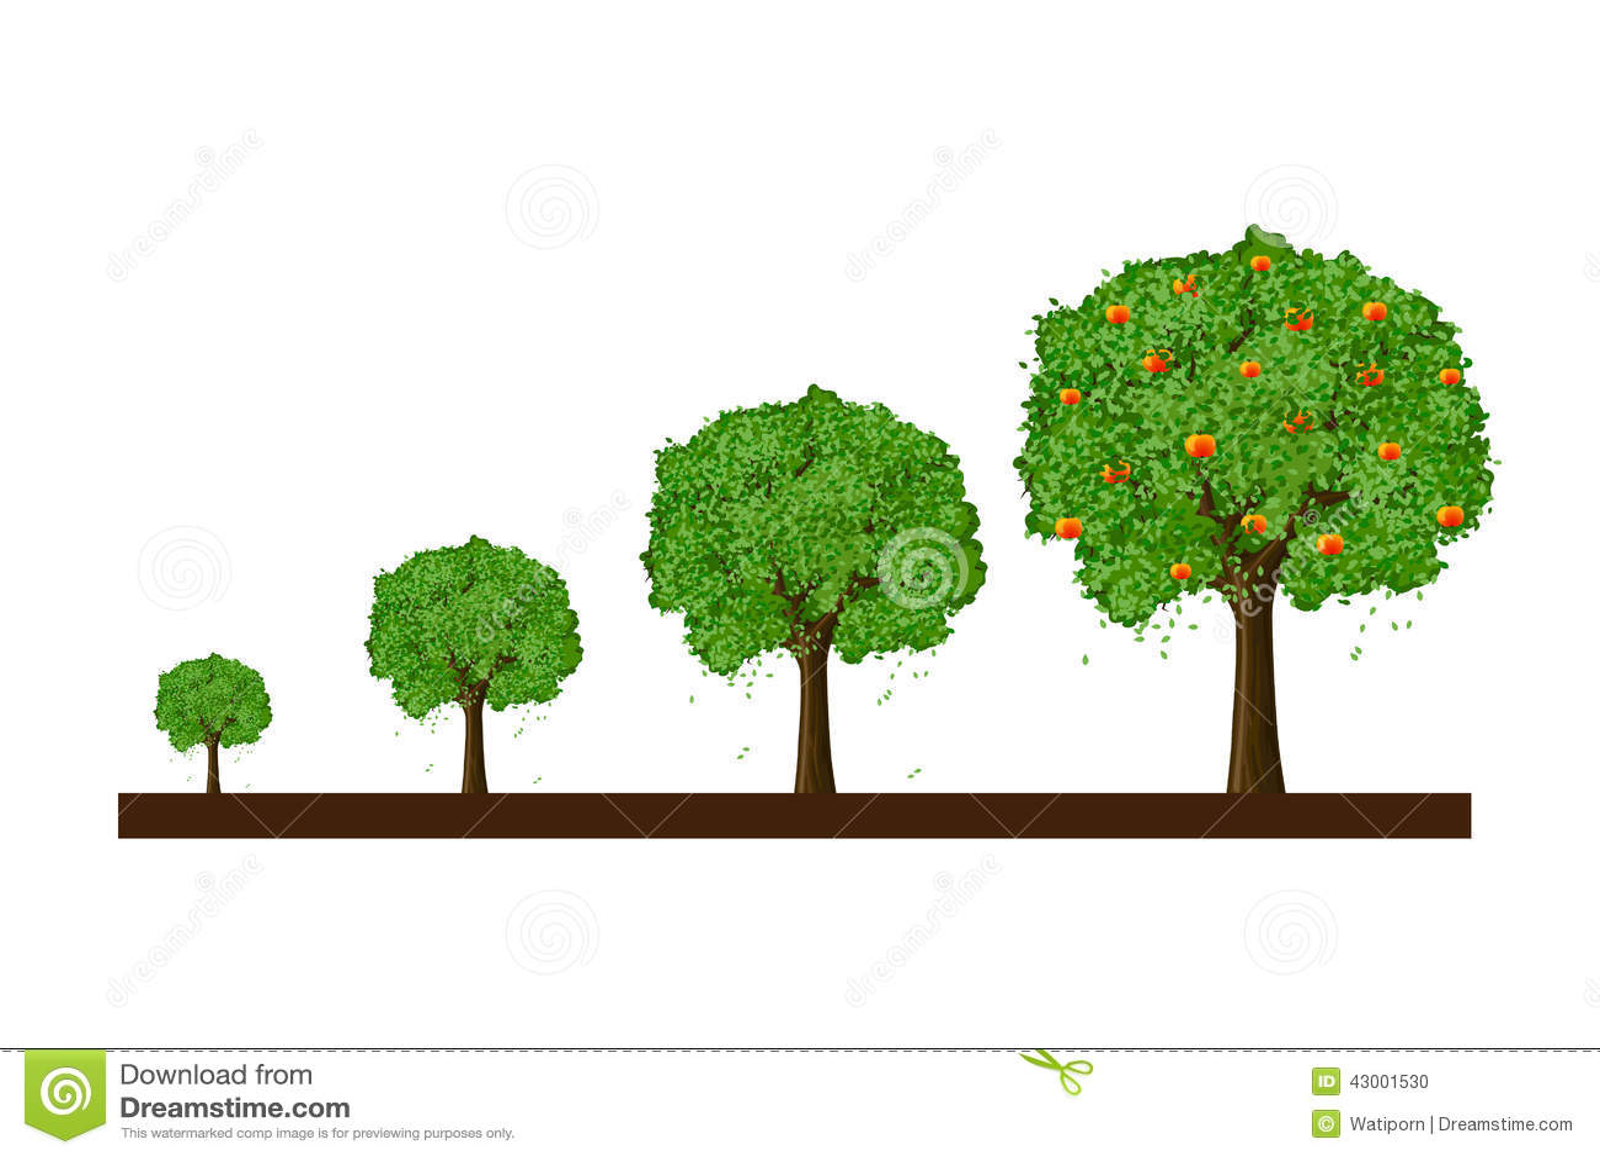 Growth Of Tree Stock Illustration